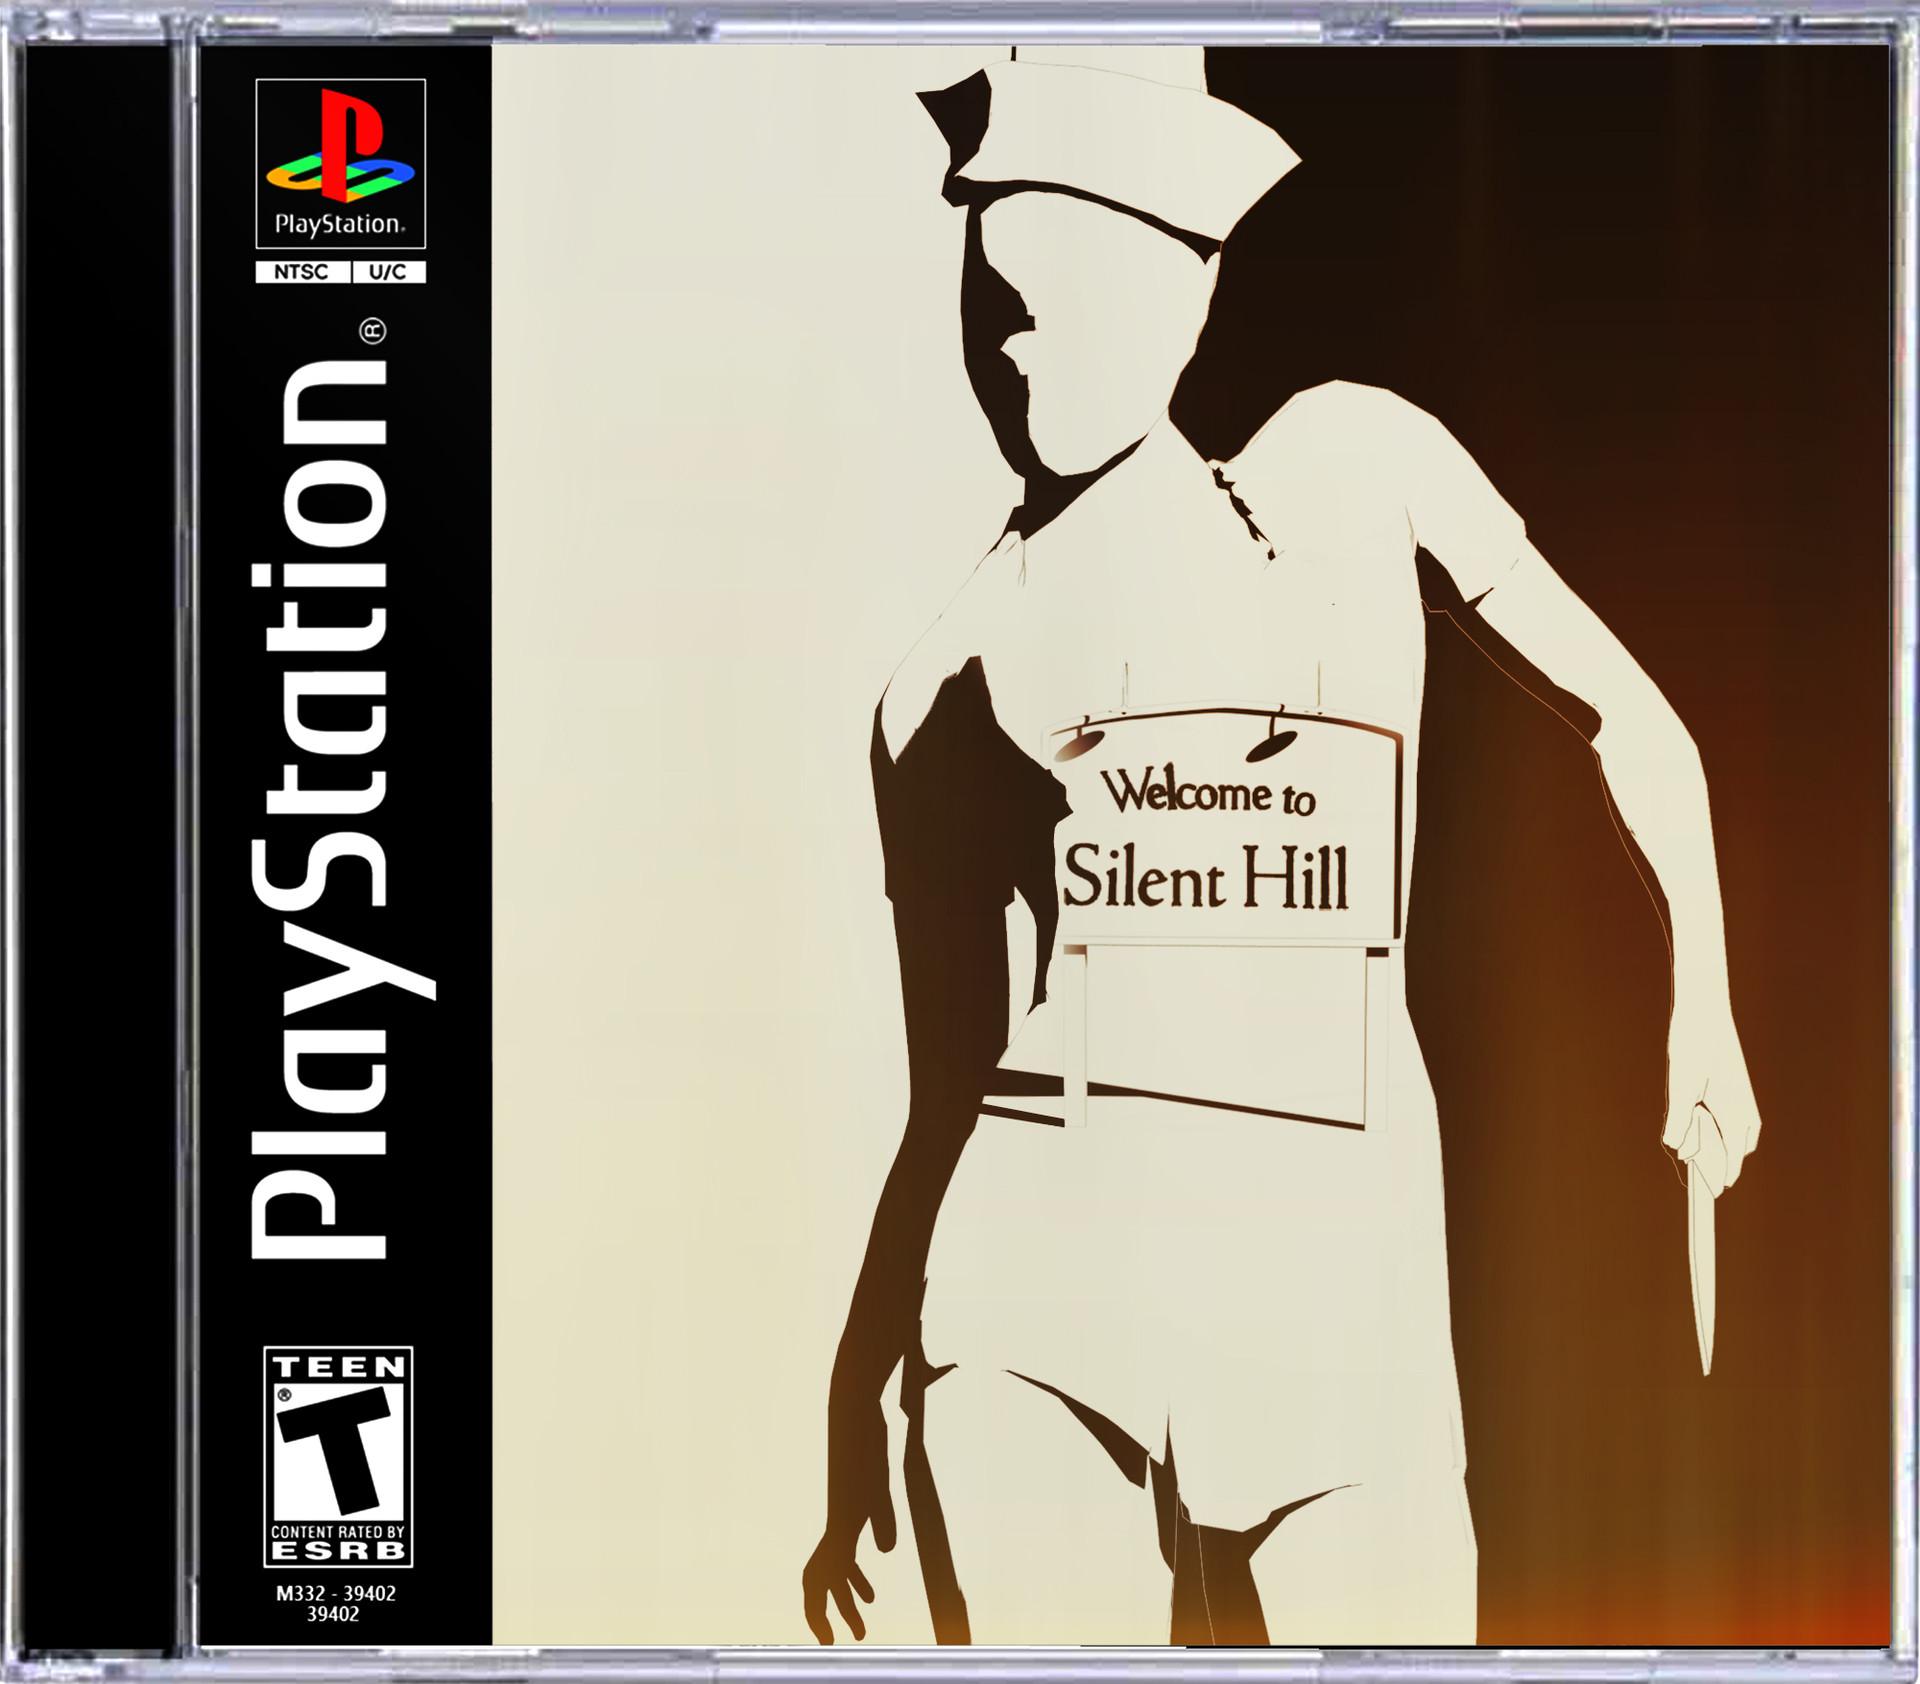 Ben nicholas ps1 gamecover silenthill